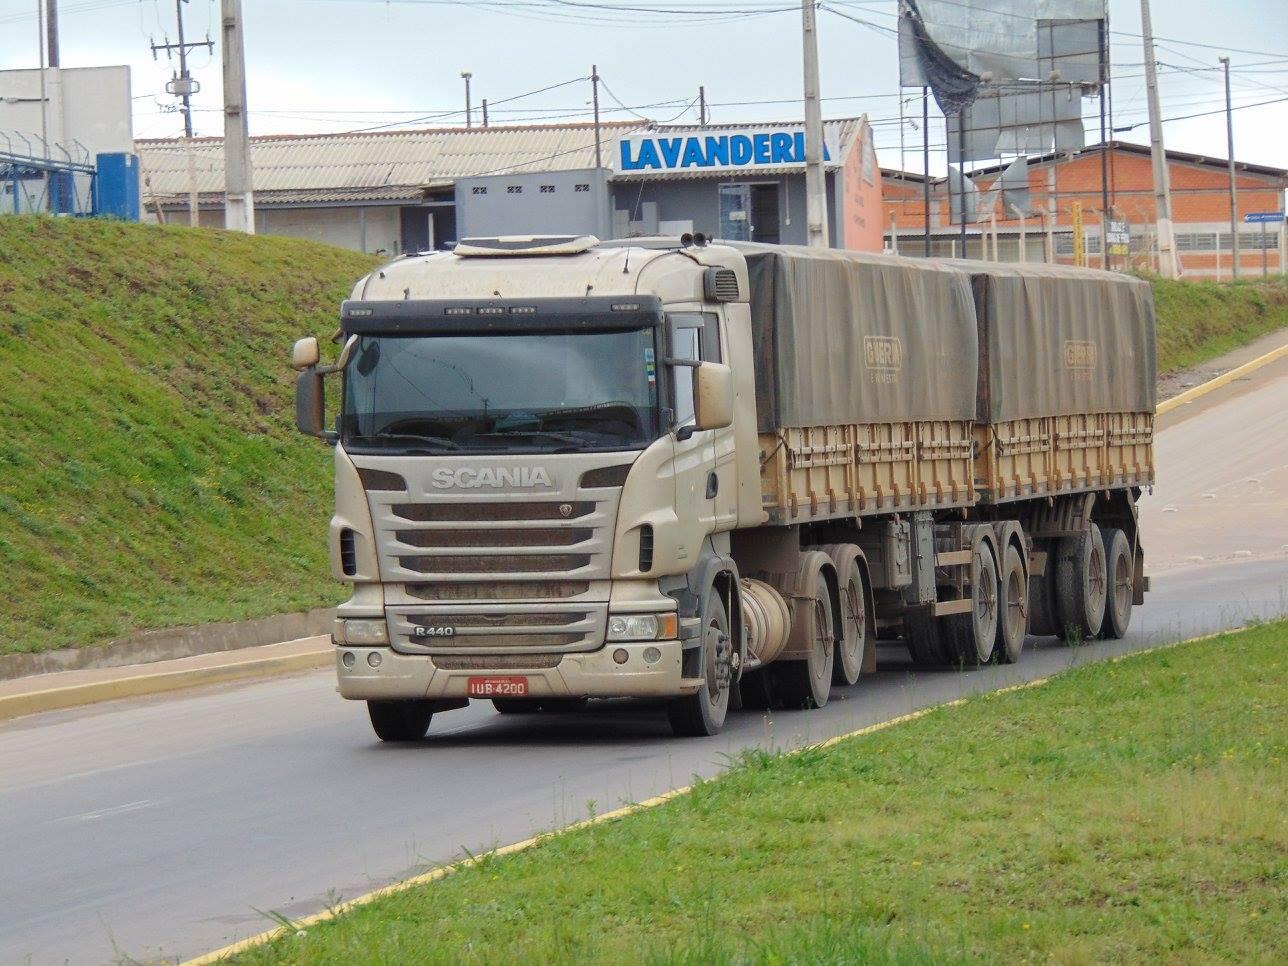 Scania-photo-5-1--2015-30